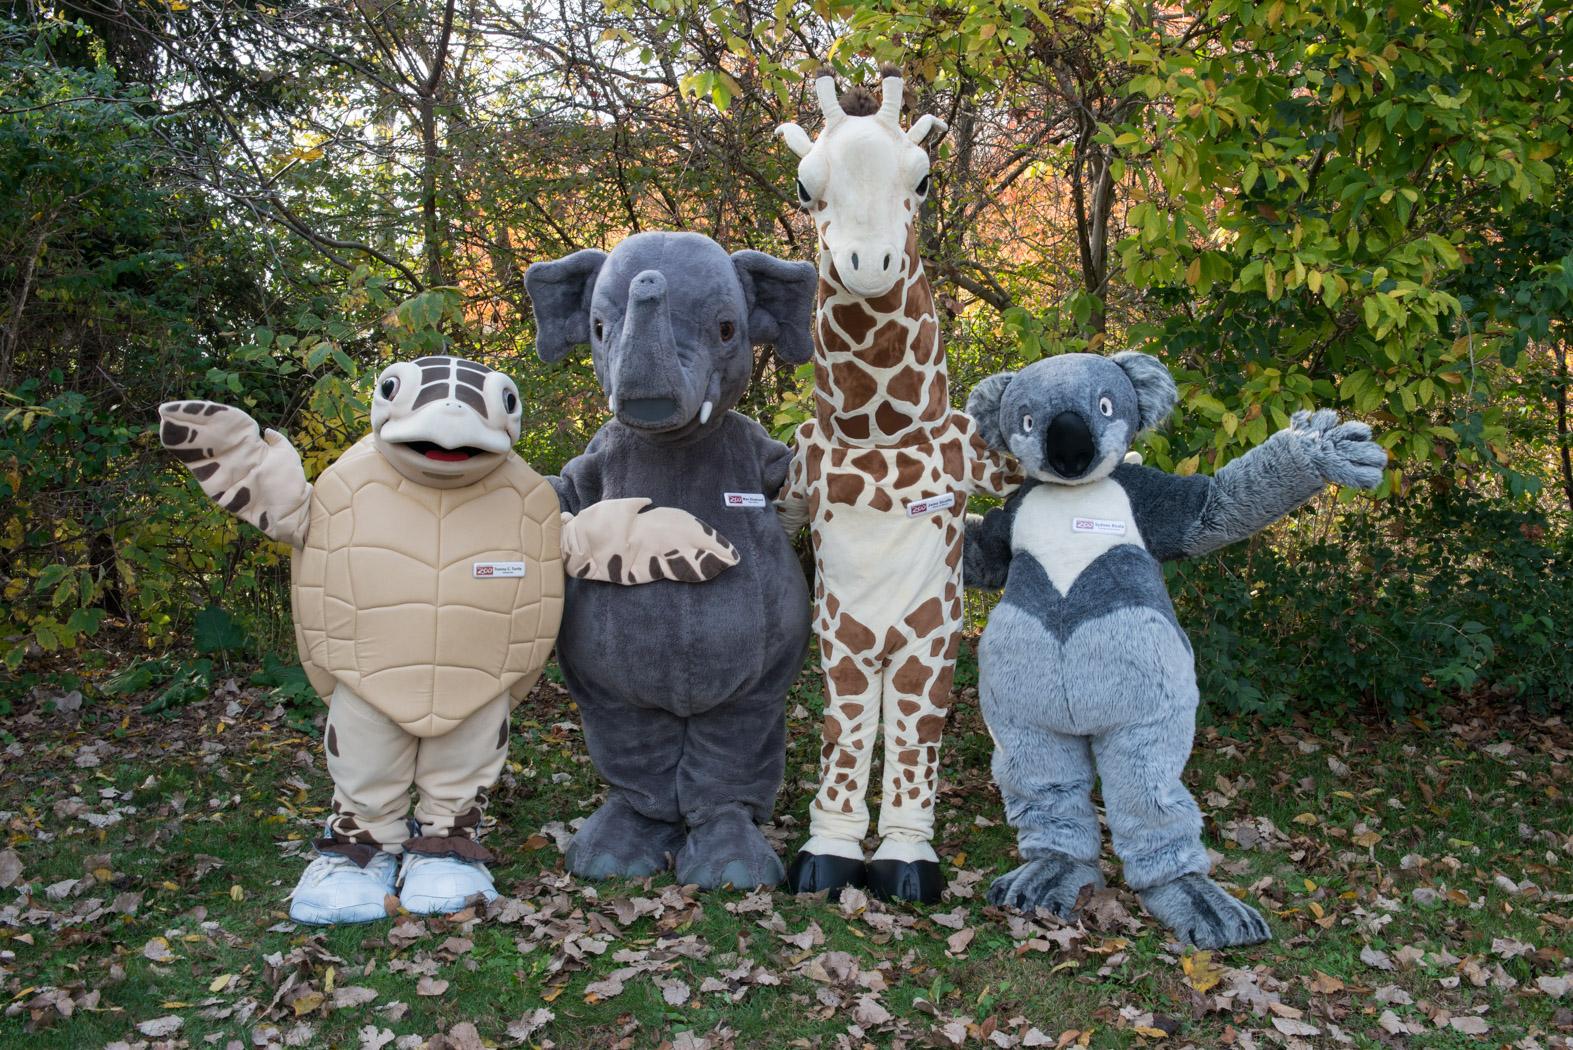 Zoo Characters 7261 - Grahm S. Jones, Columbus Zoo and Aquarium